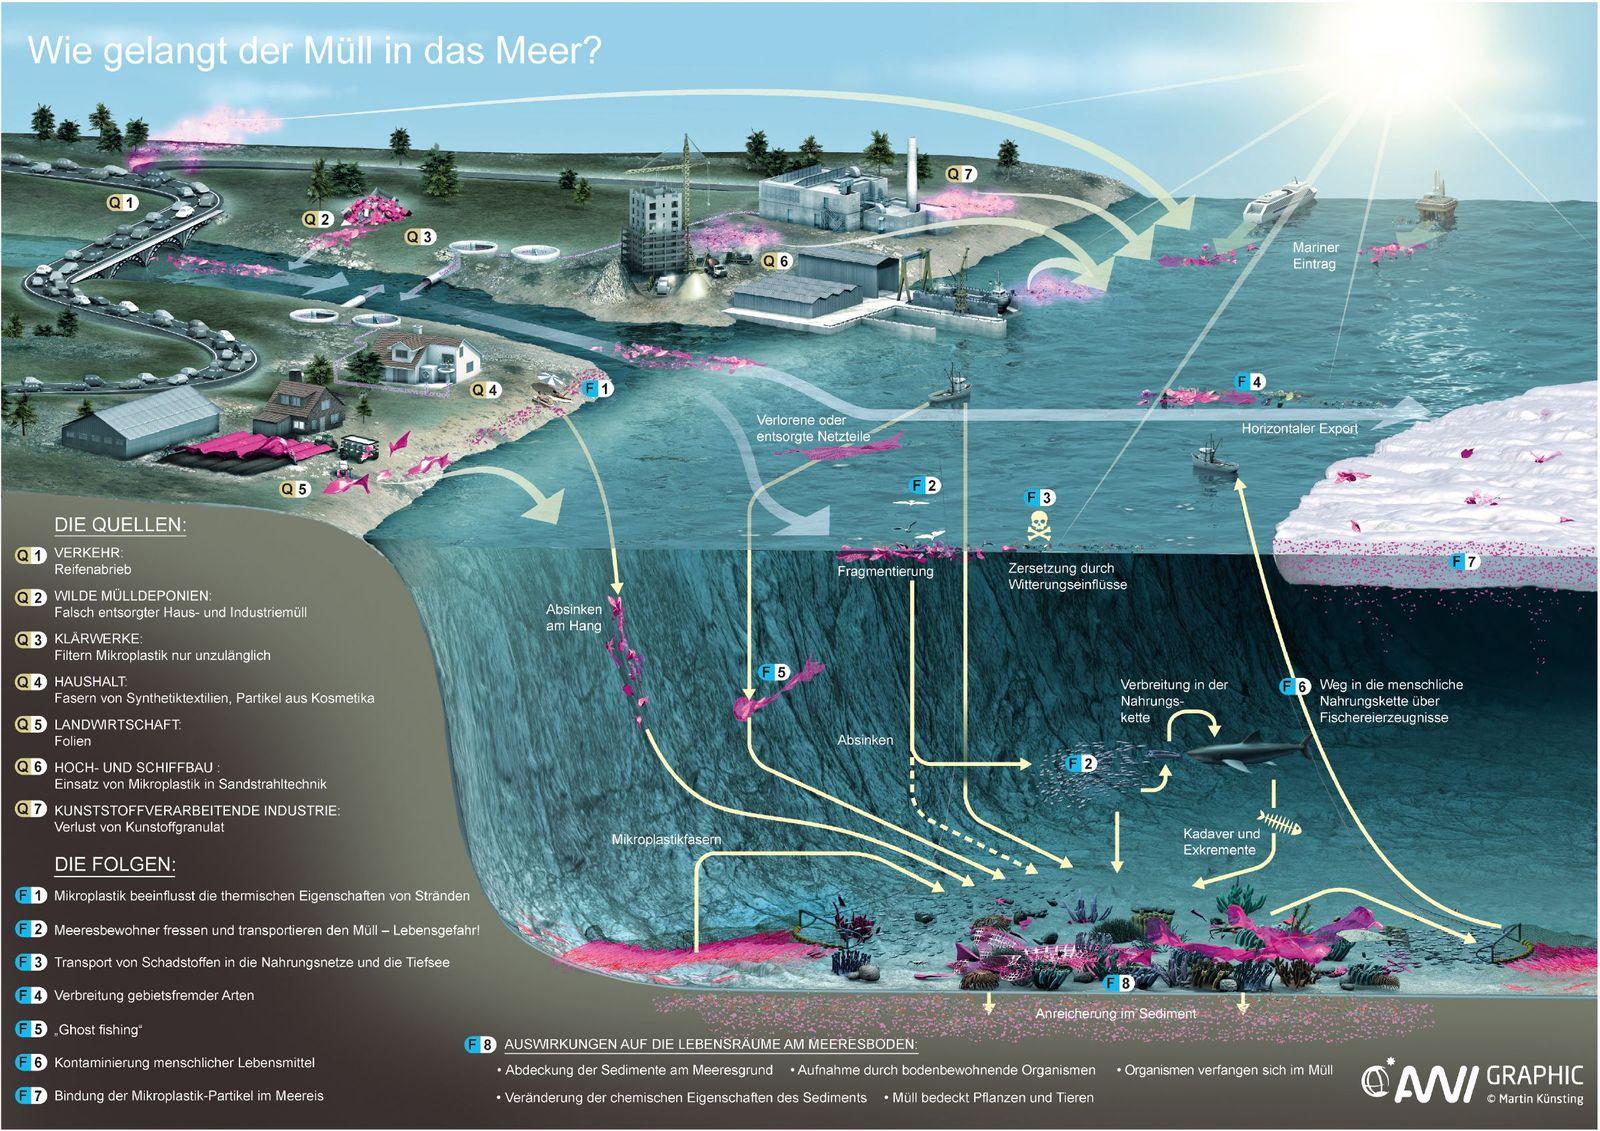 EINMALIGE VERWENDUNG Müll im Meer / Mikroplastikpartikel